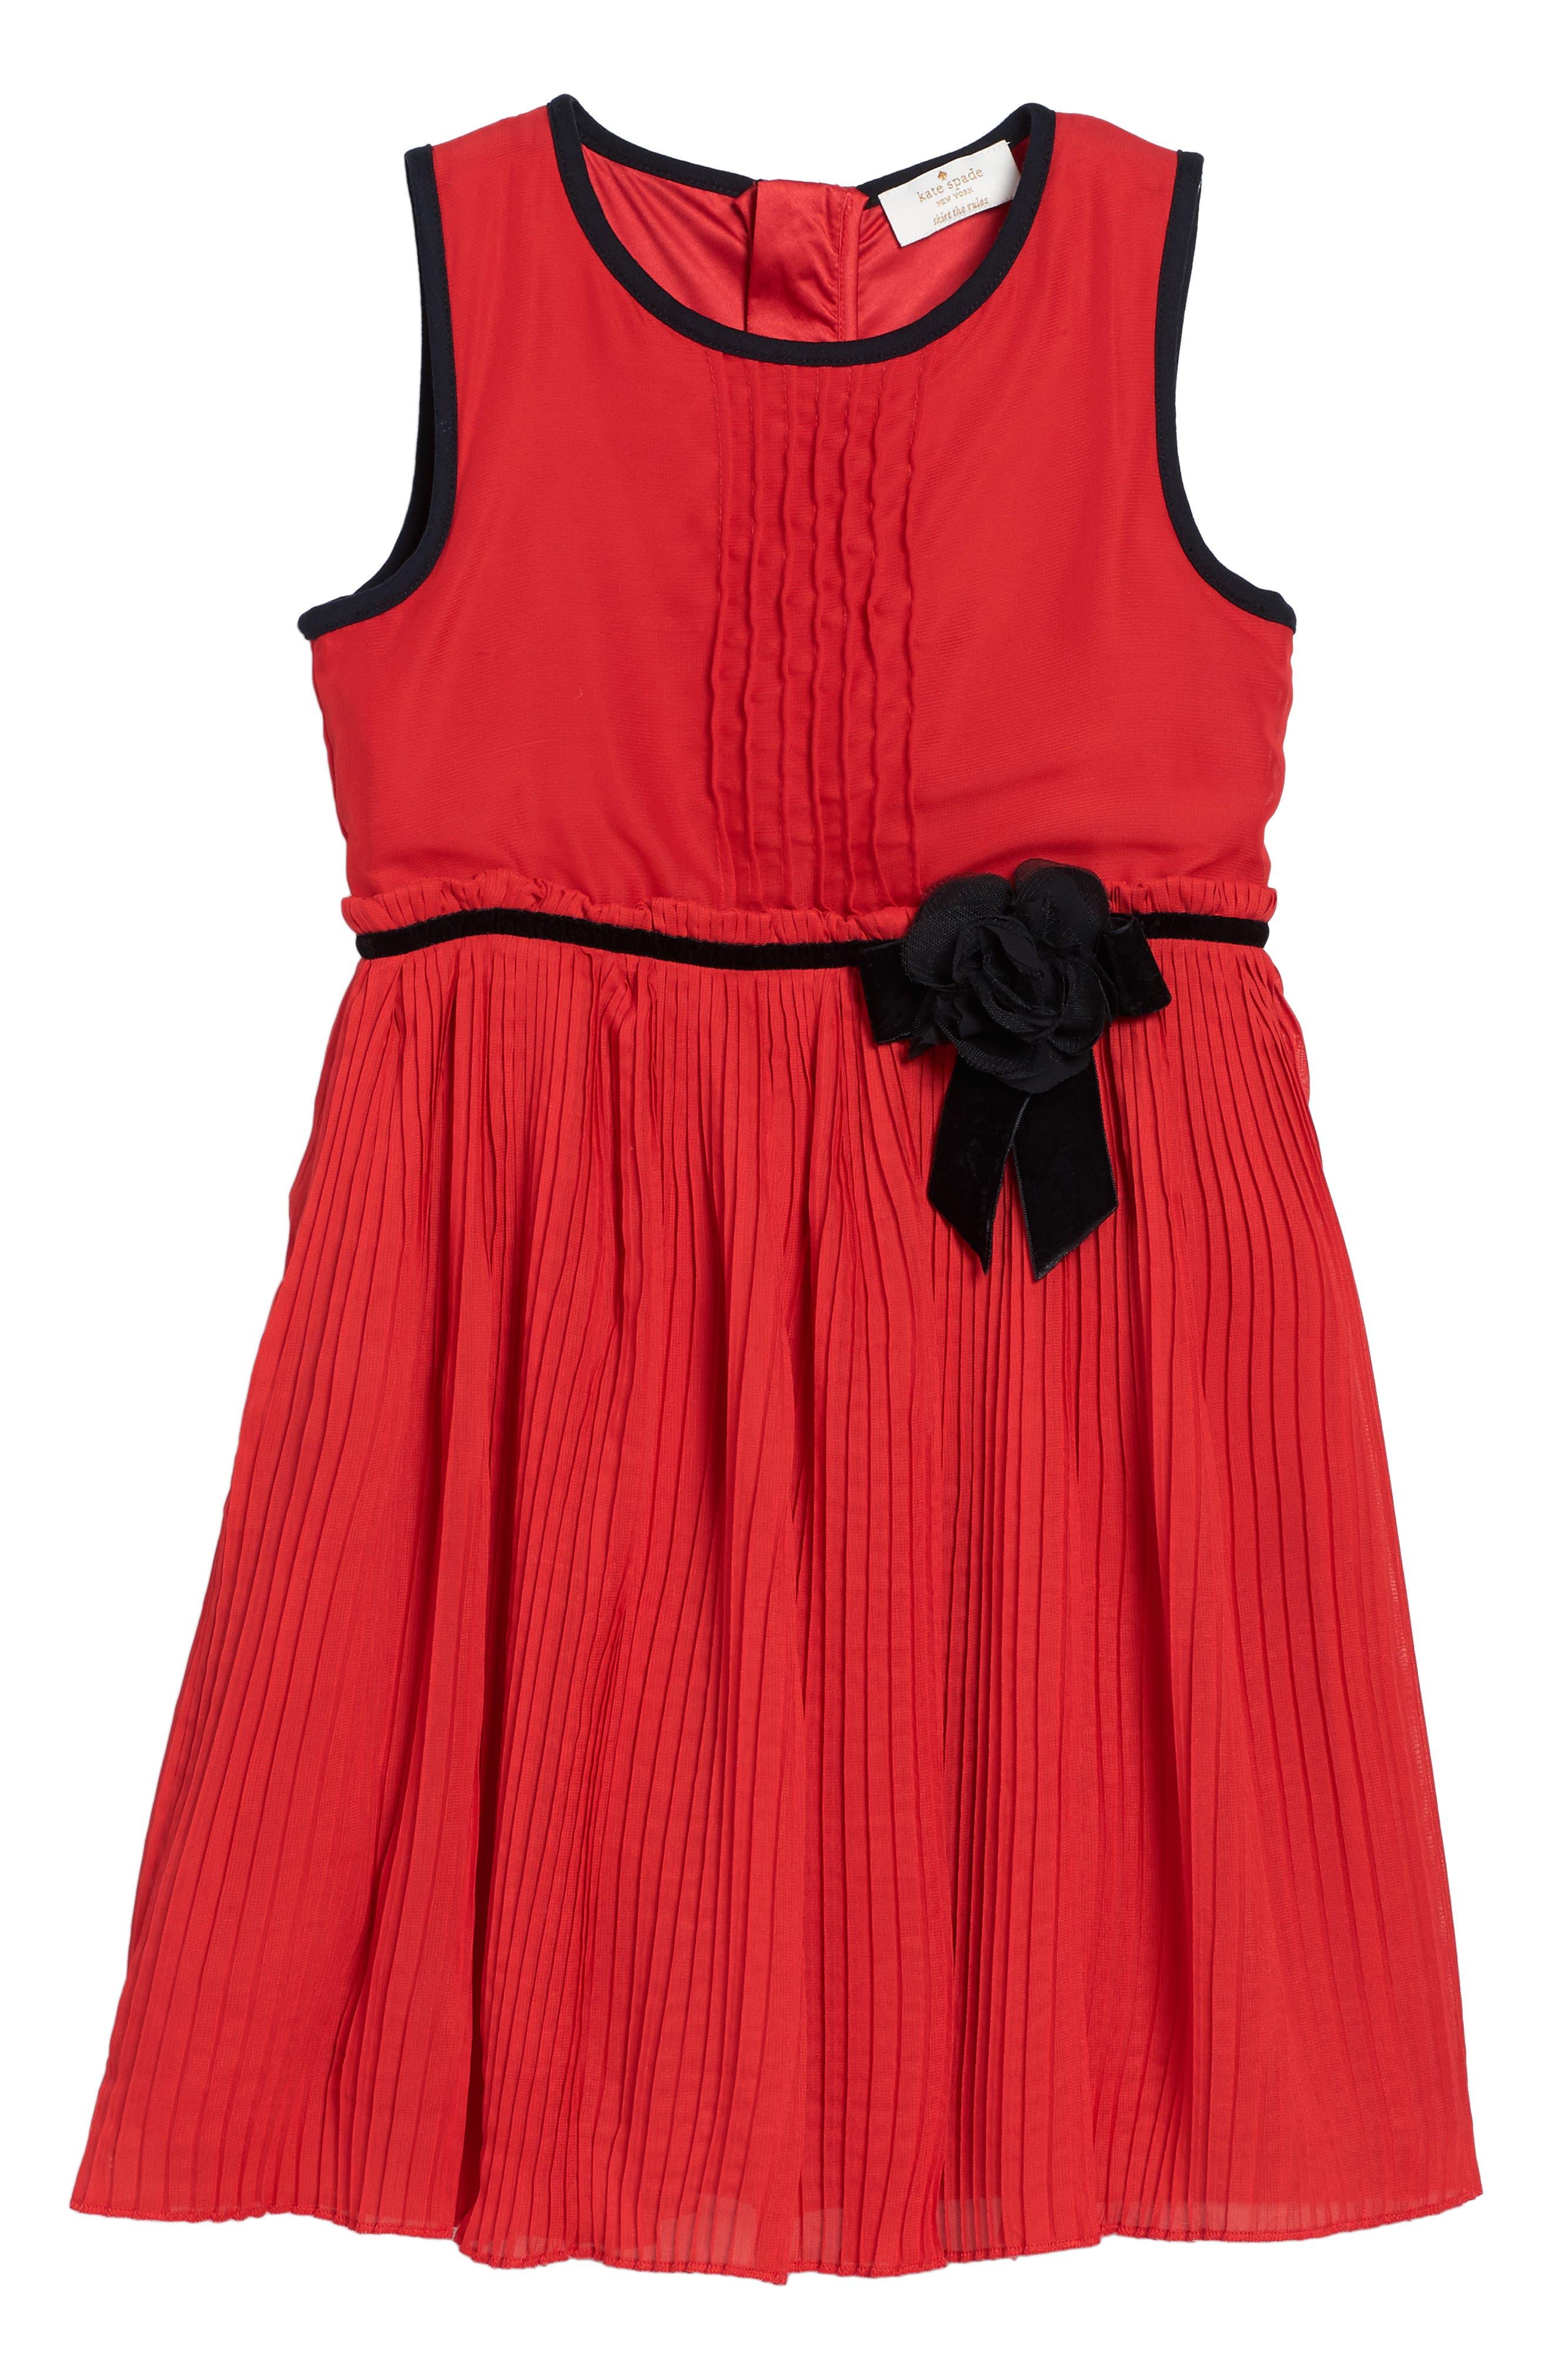 Main Image - kate spade new york pleated chiffon party dress (Big Girls)